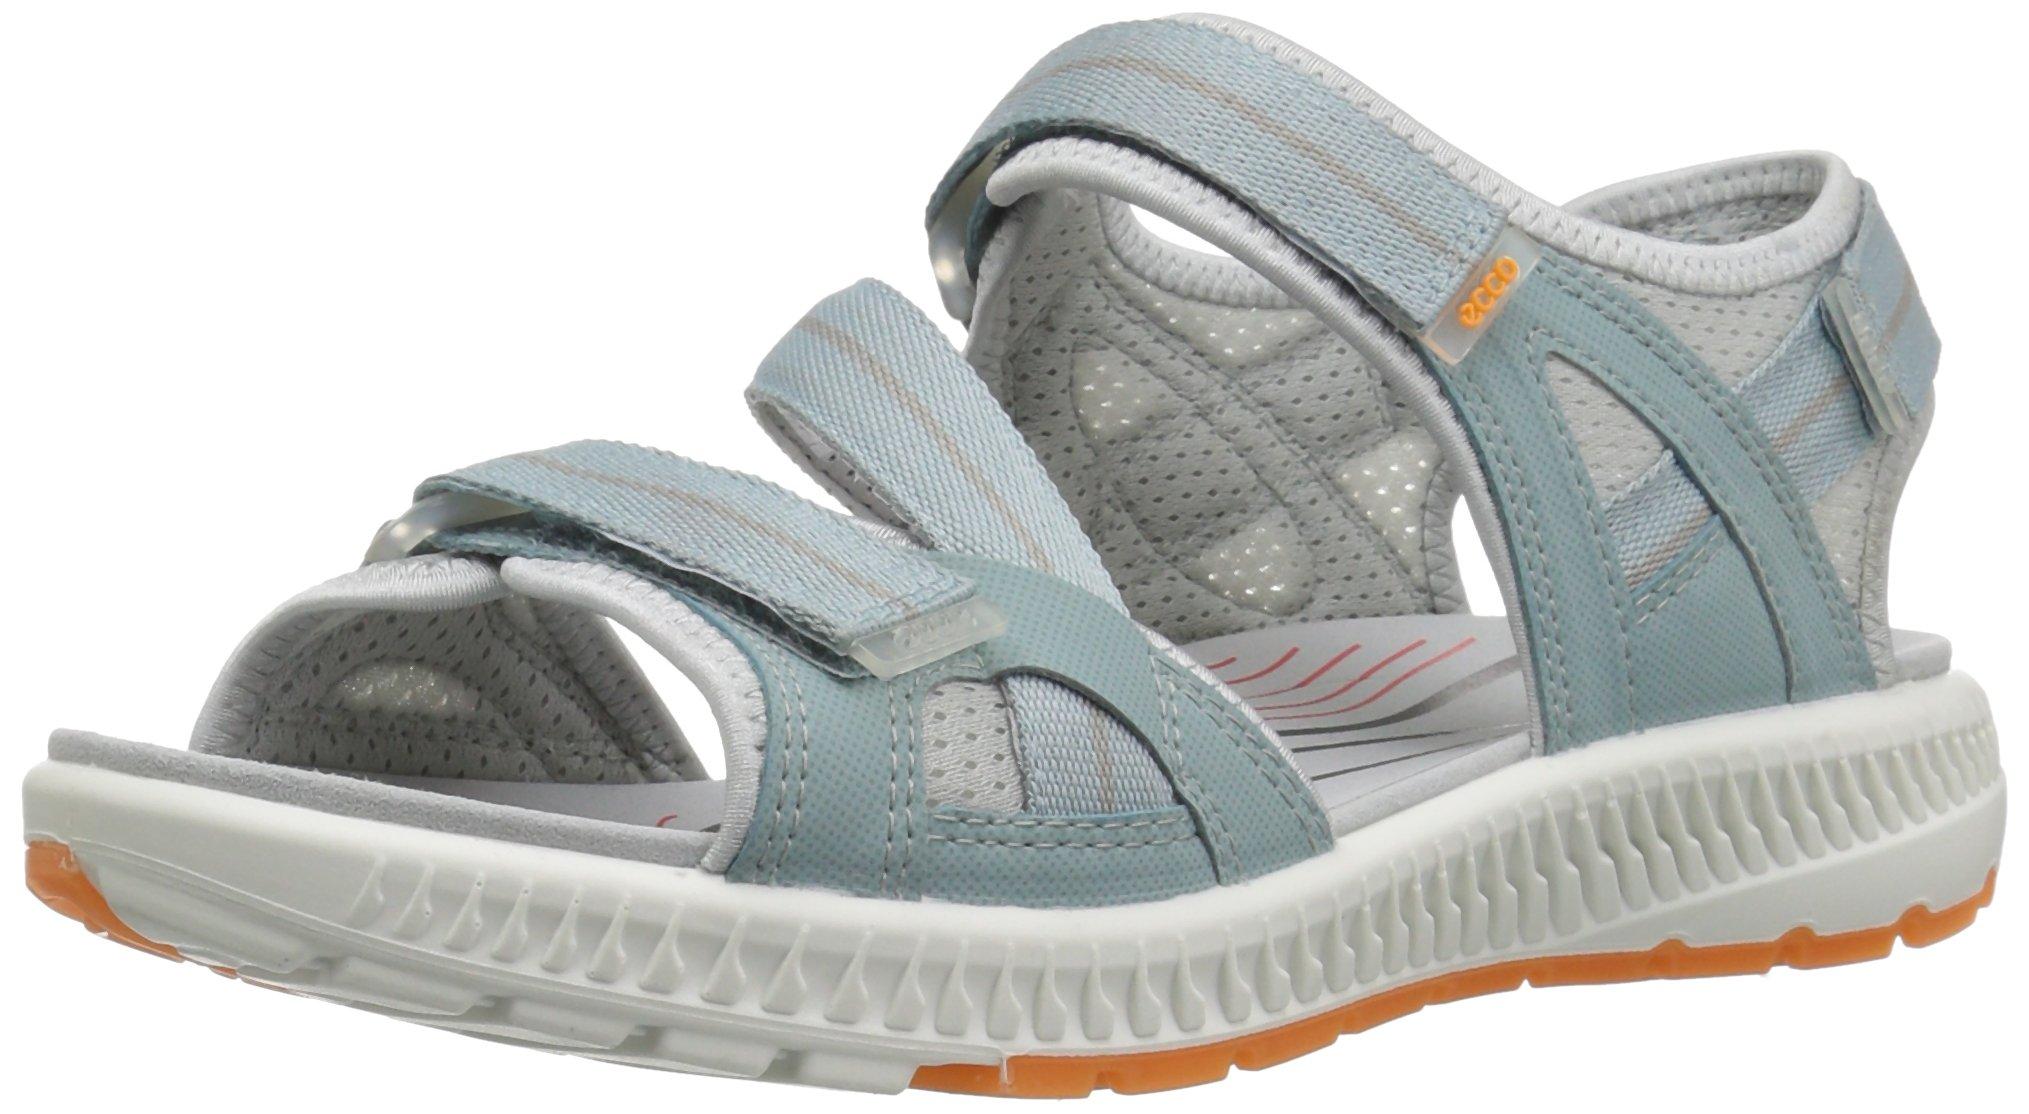 ECCO Women's Terra 3S Athletic Sandal, Arona/Papaya, 40 EU/9-9.5 M US